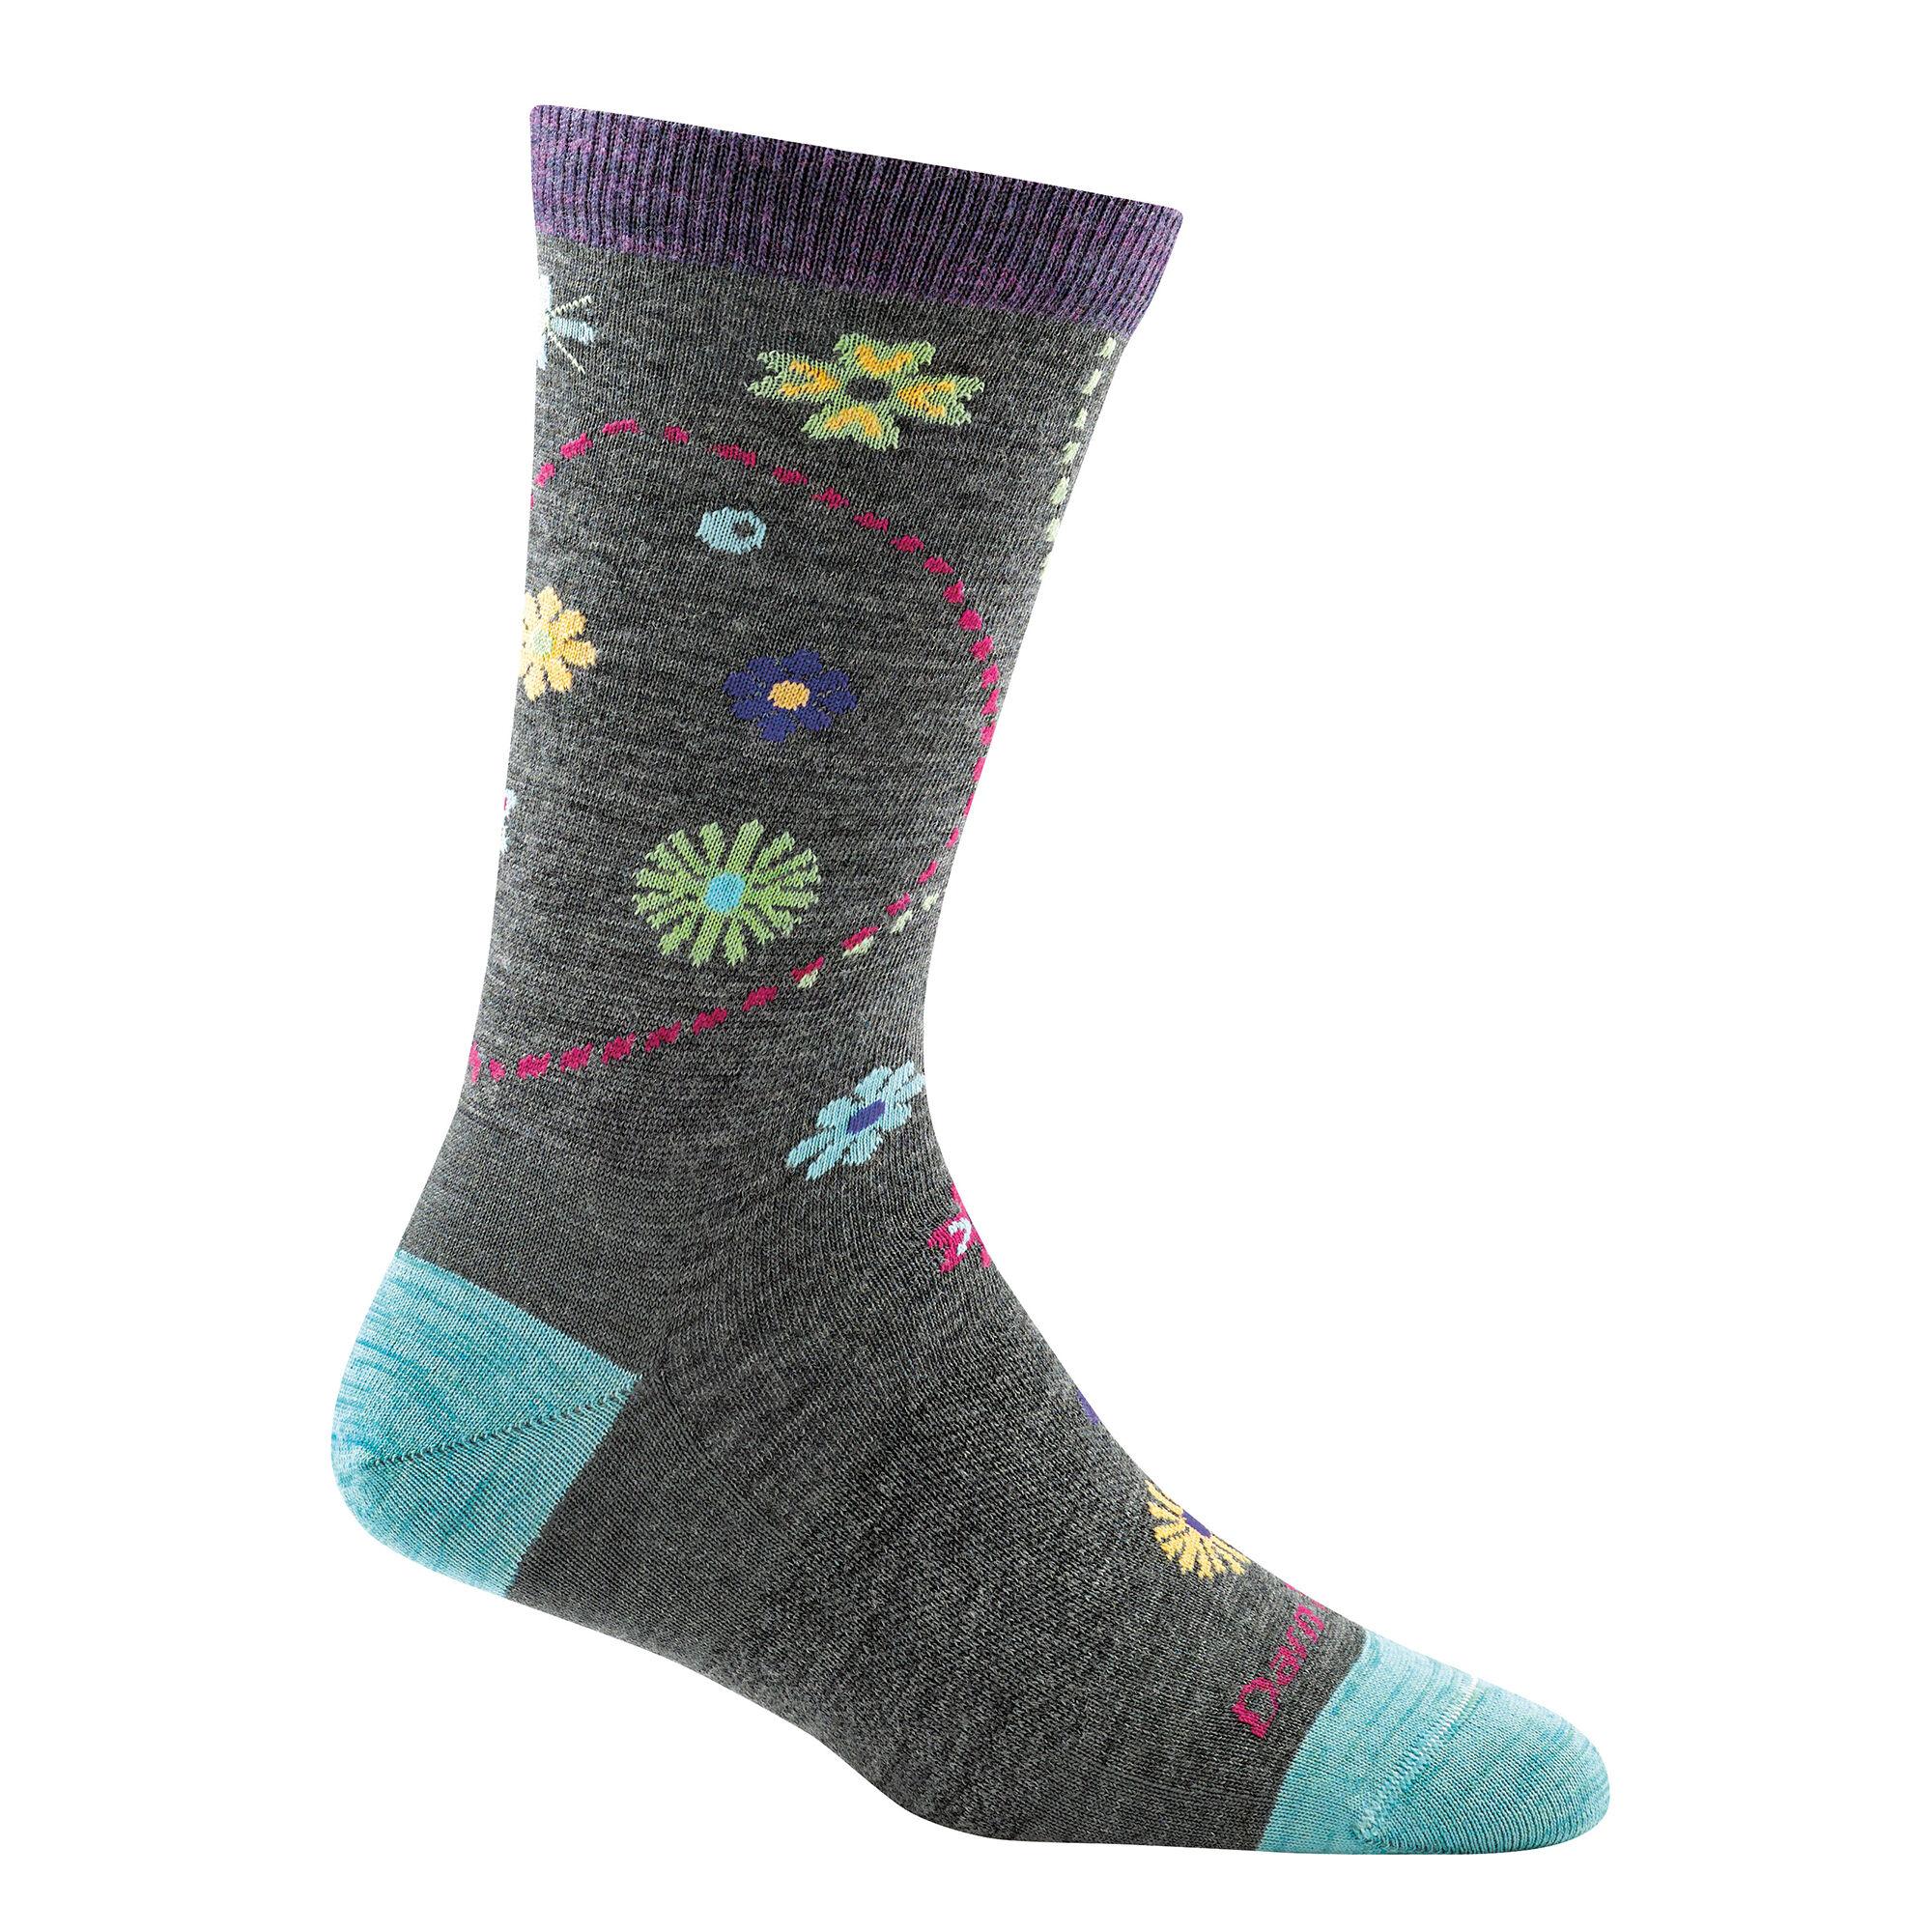 Darn Tough Sock Darn Tough Women's Garden Crew Sock